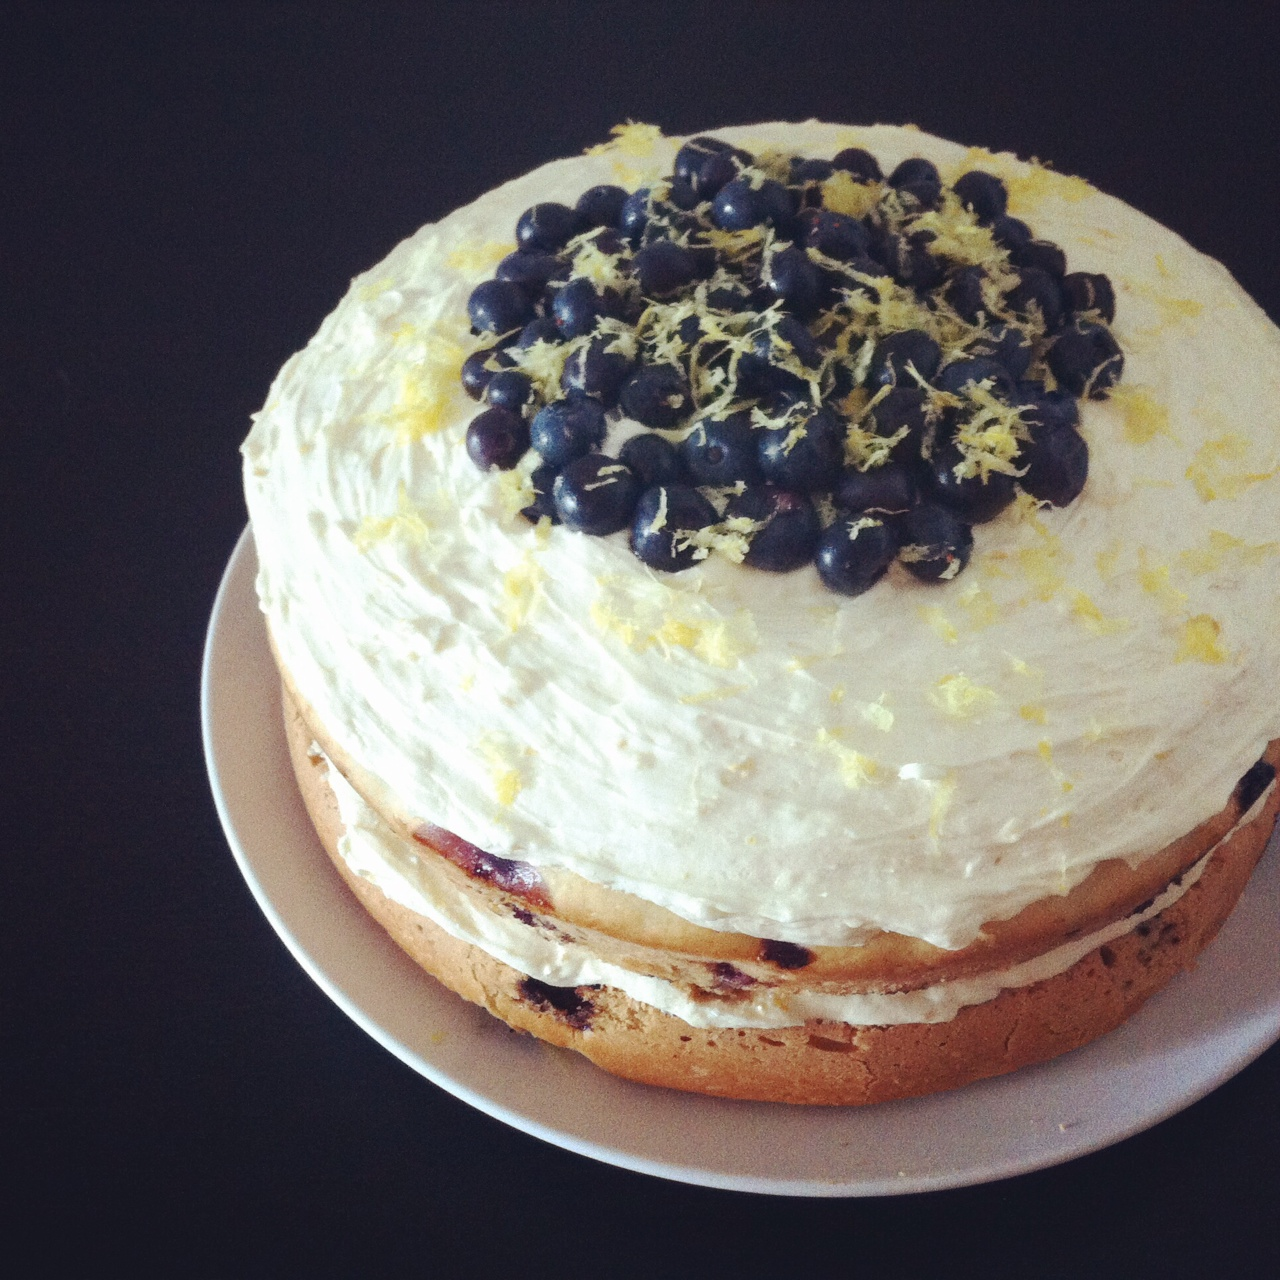 Vegan Lemon Blueberry Layer Cake By Waz Wu